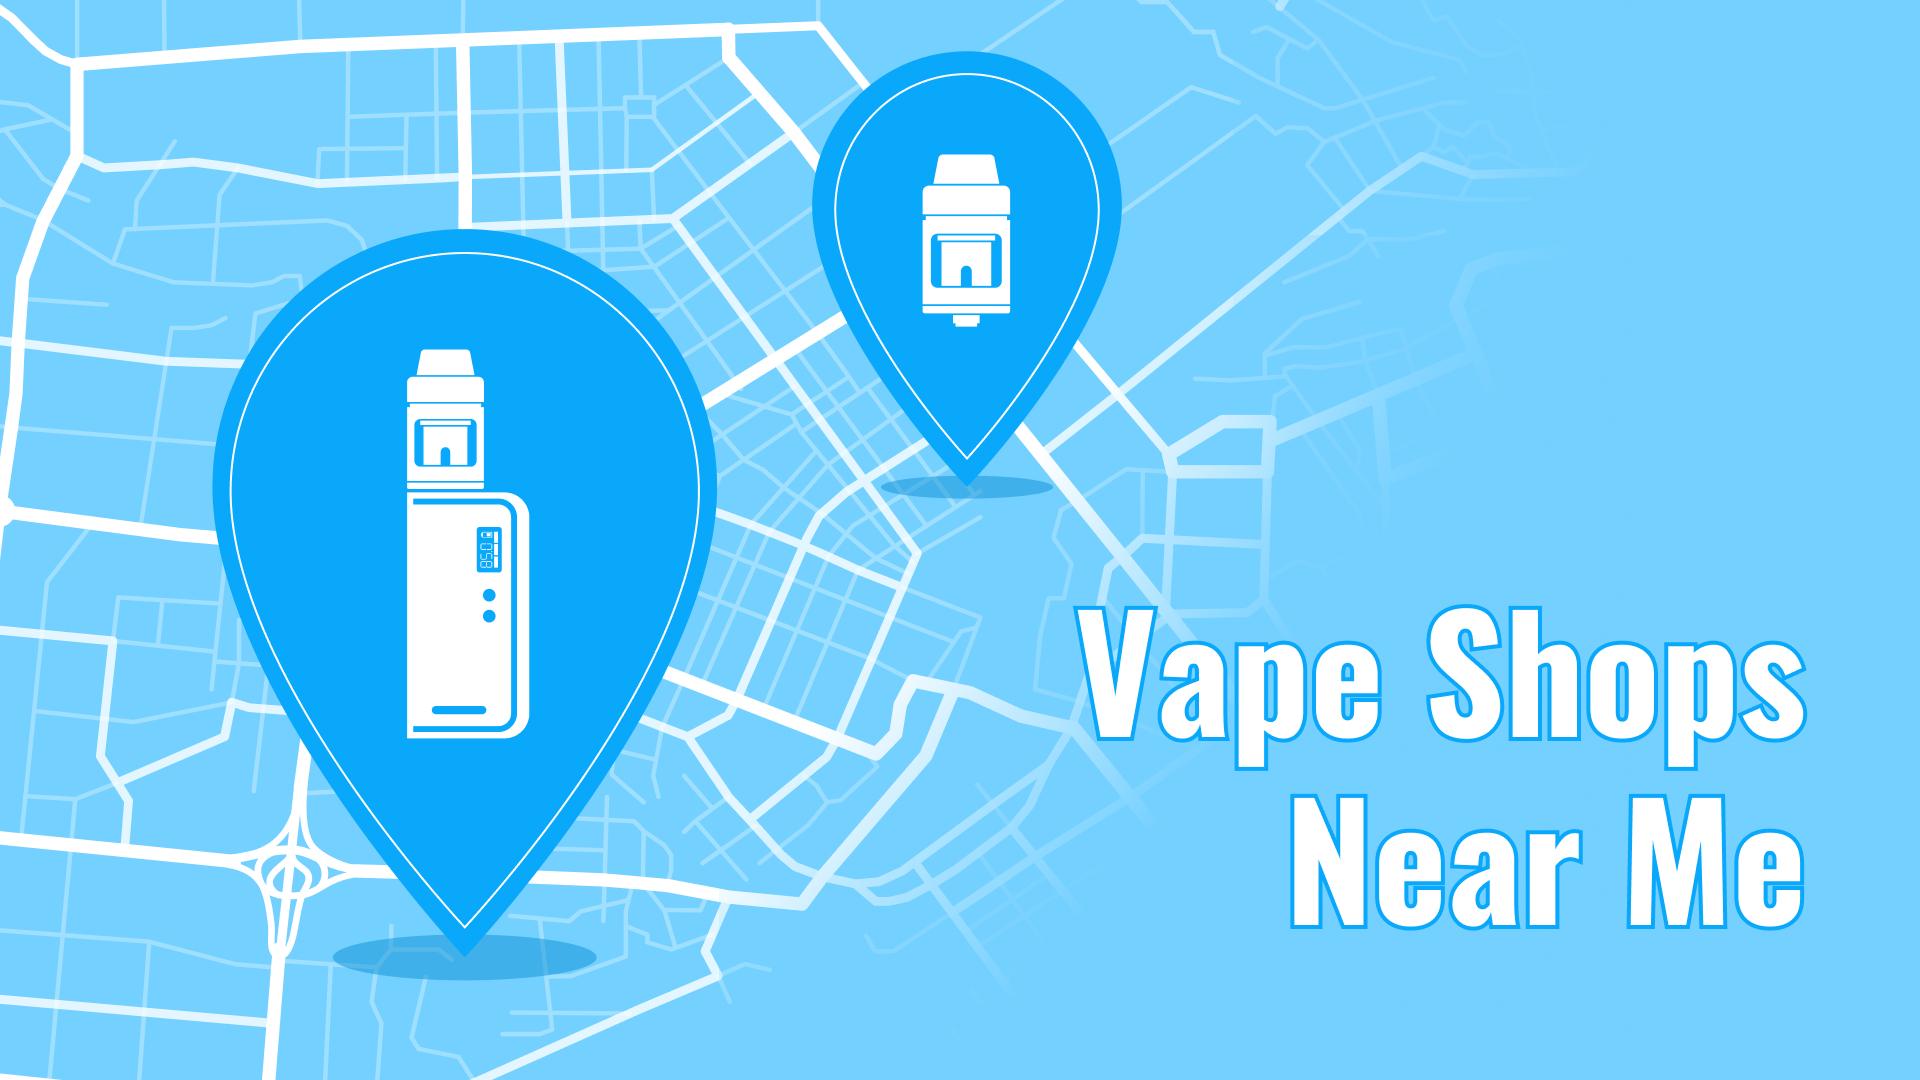 Best Vape Shops Near Me Locator | Find the Closest Vape Stores